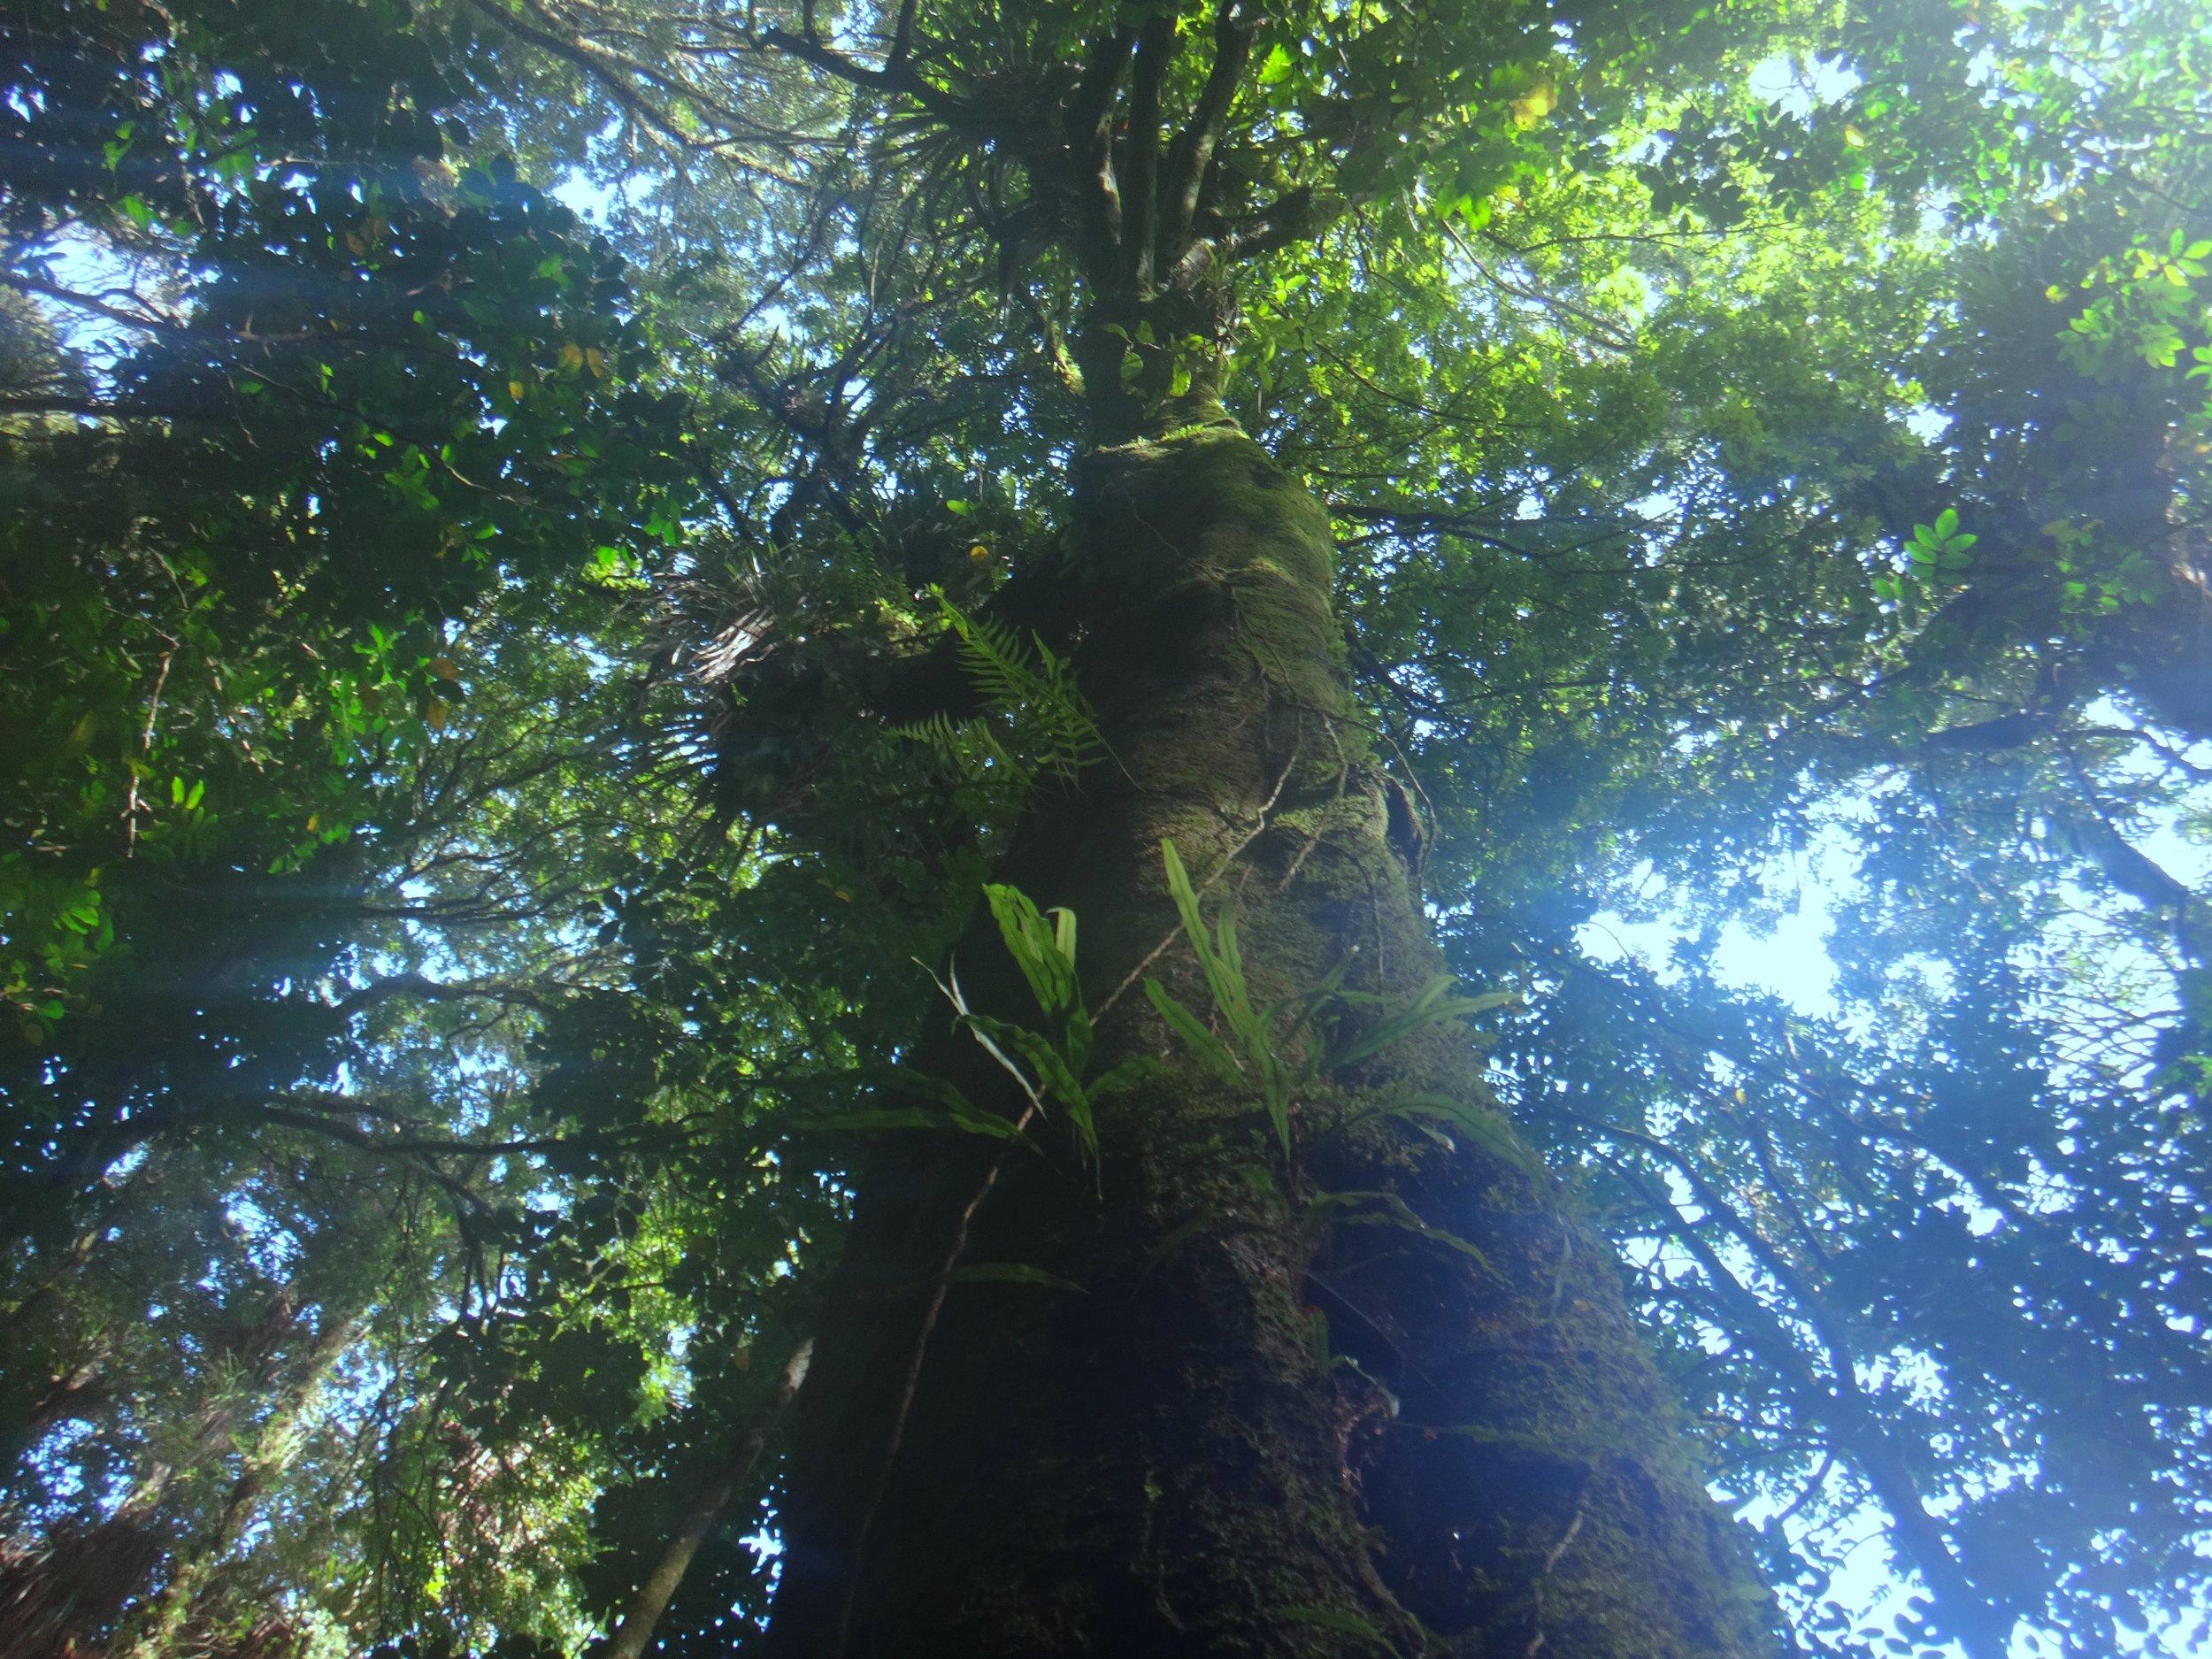 Huge, beautiful and calming trees.